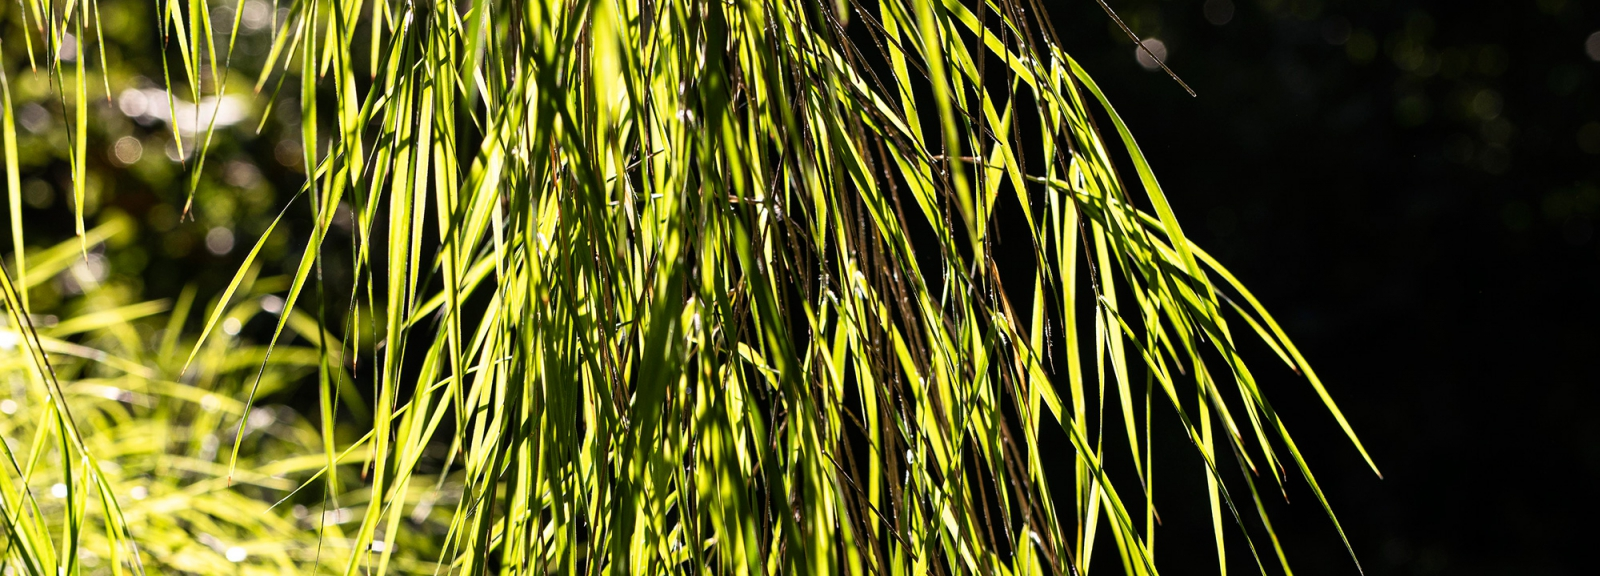 Bambou pleureur mexicain (Otatea acuminata) - Jardin botanique Val Rahmeh-Menton © MNHN - Agnès Iatzoura